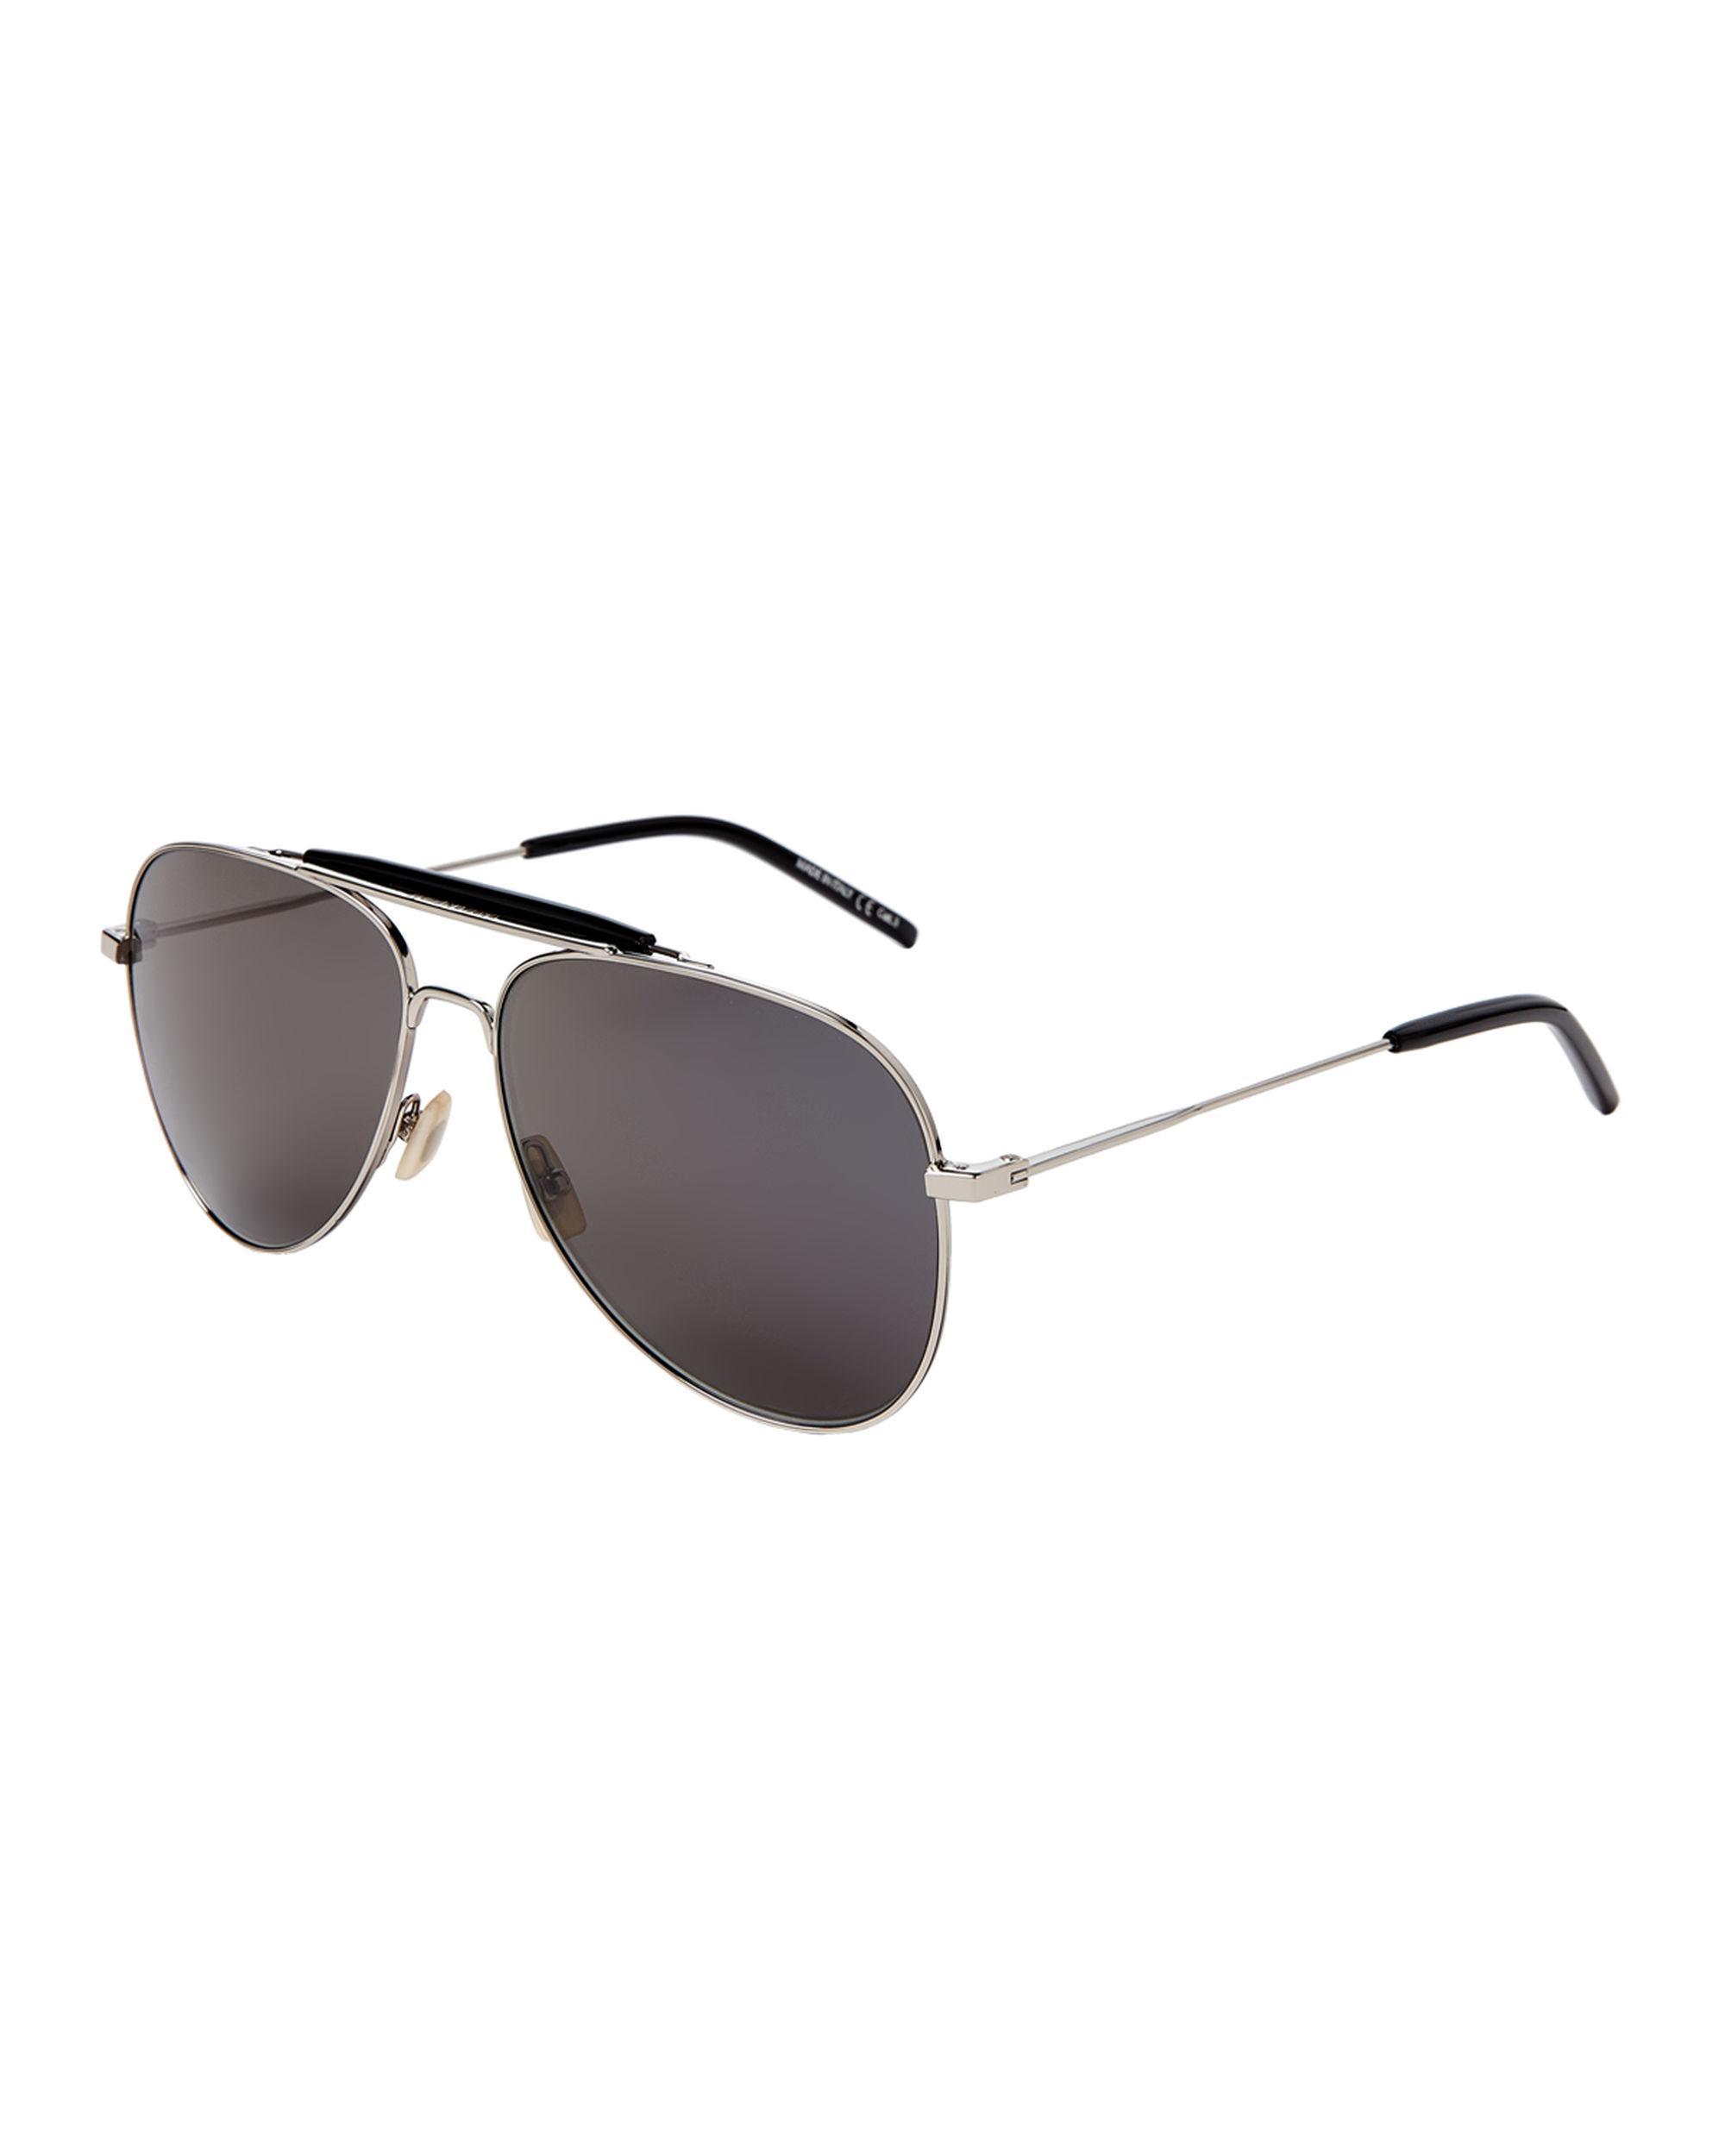 241116ae3c Men's Metallic Sl 85 Black & Silver-tone Aviator Sunglasses